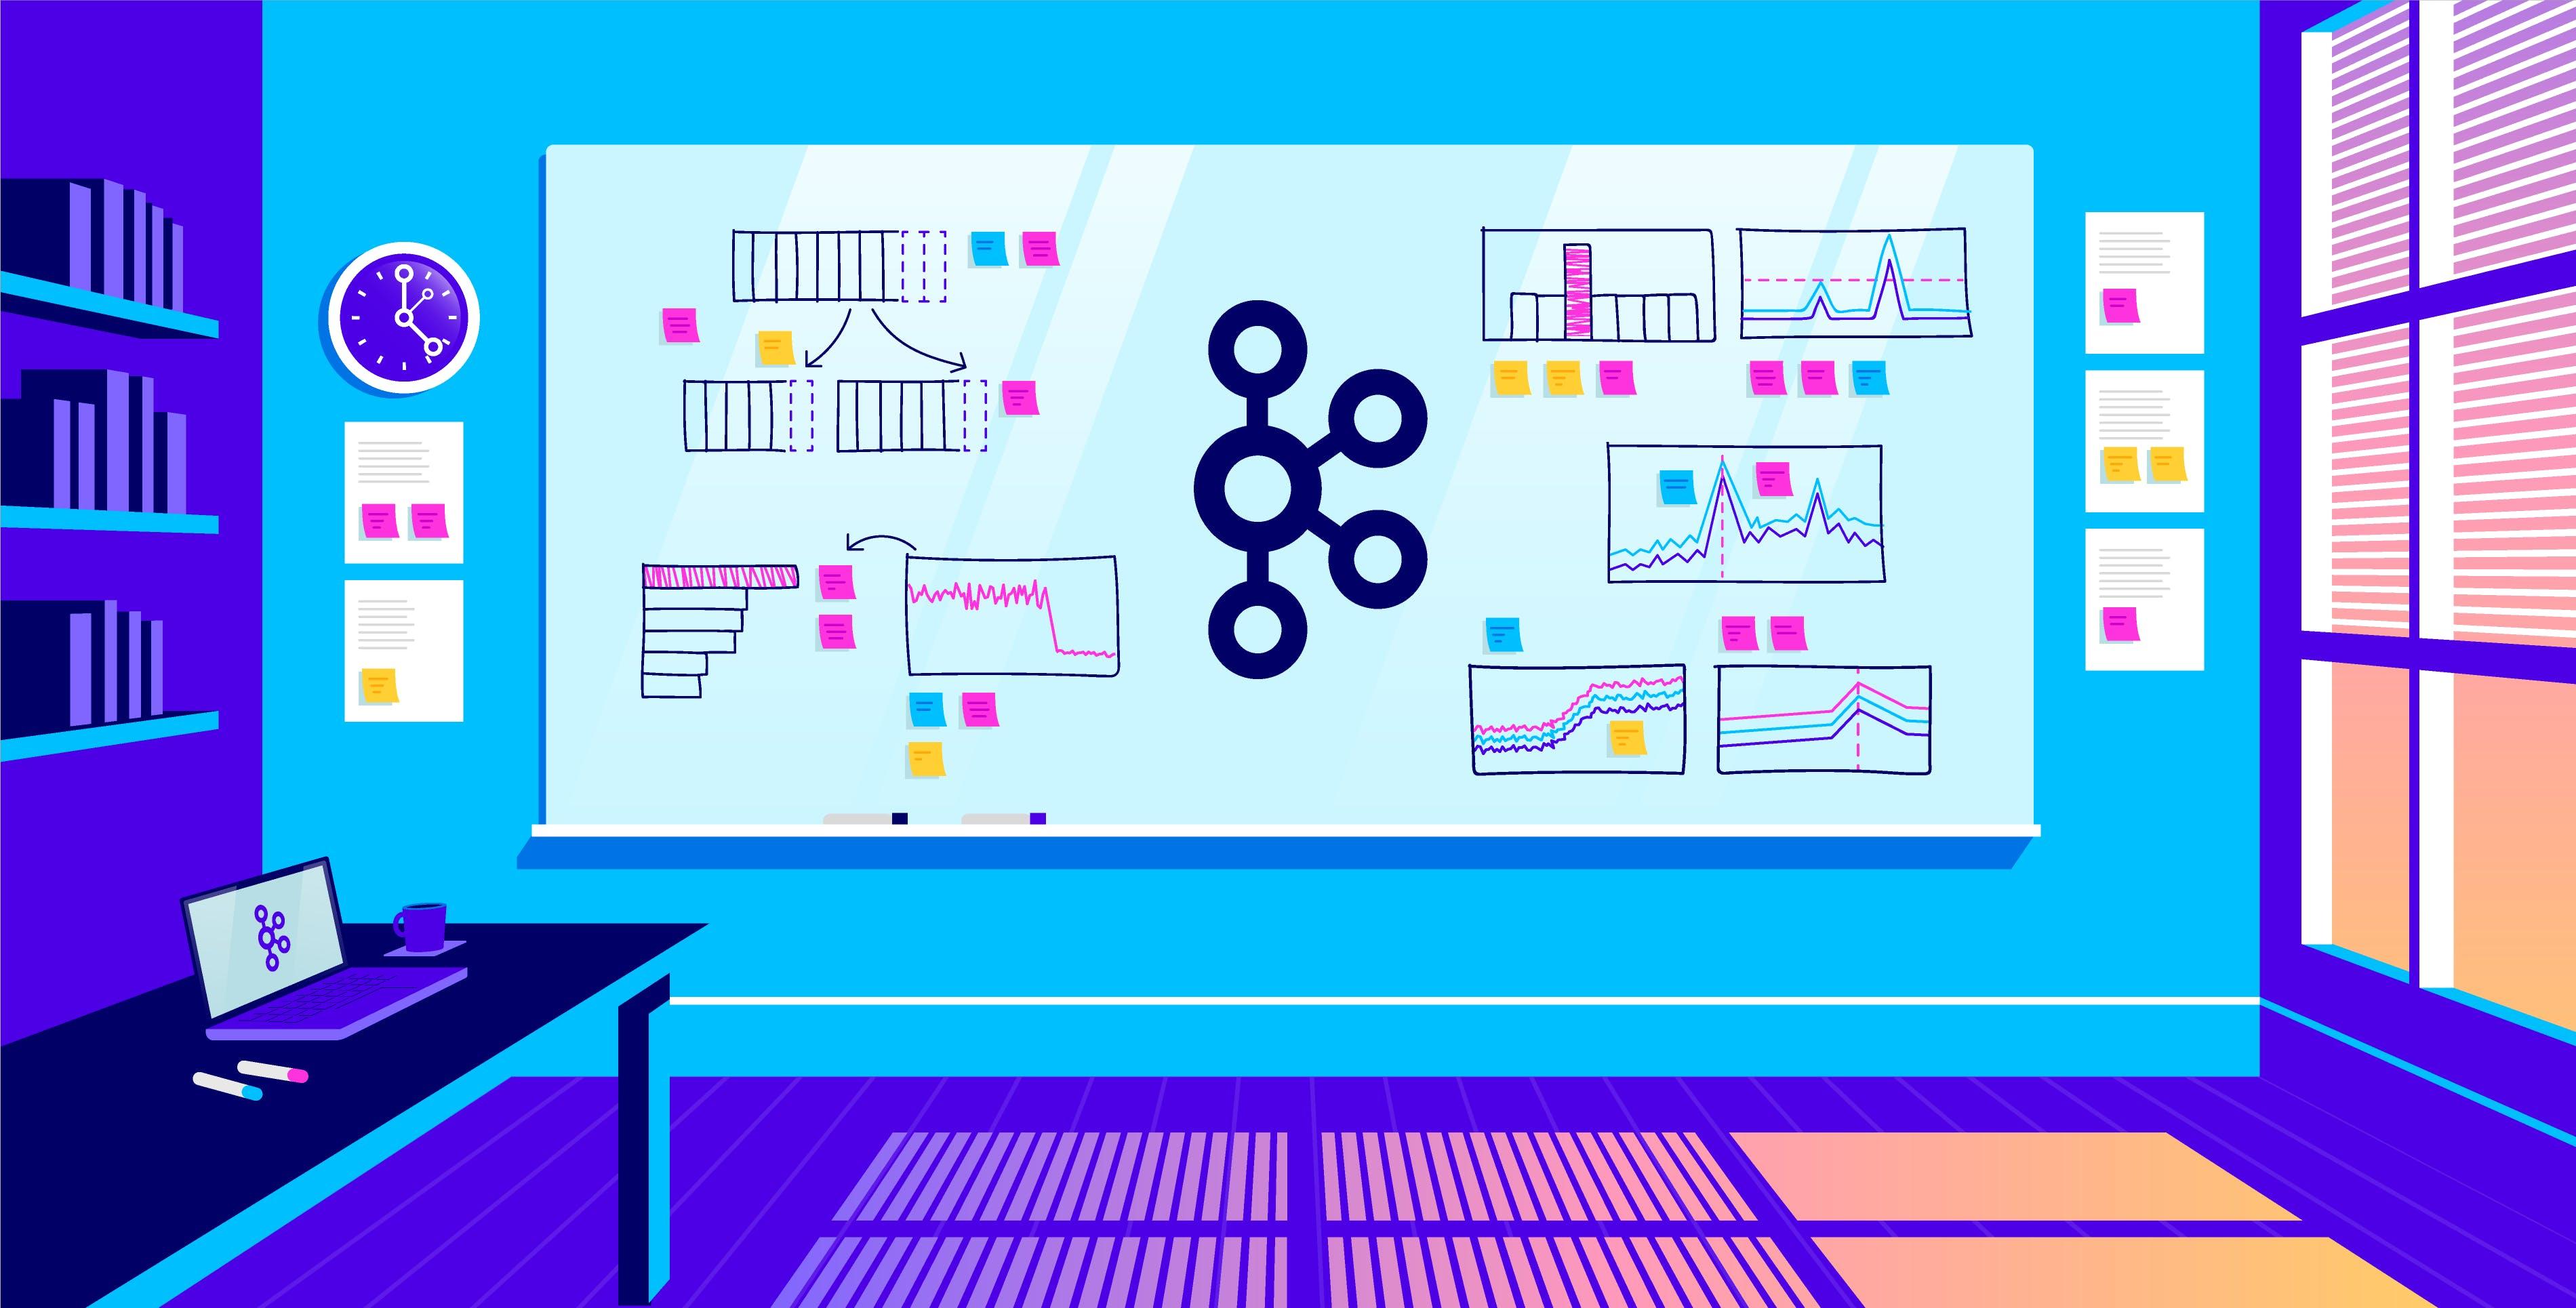 Architecture, Scalability, Big Data - cover